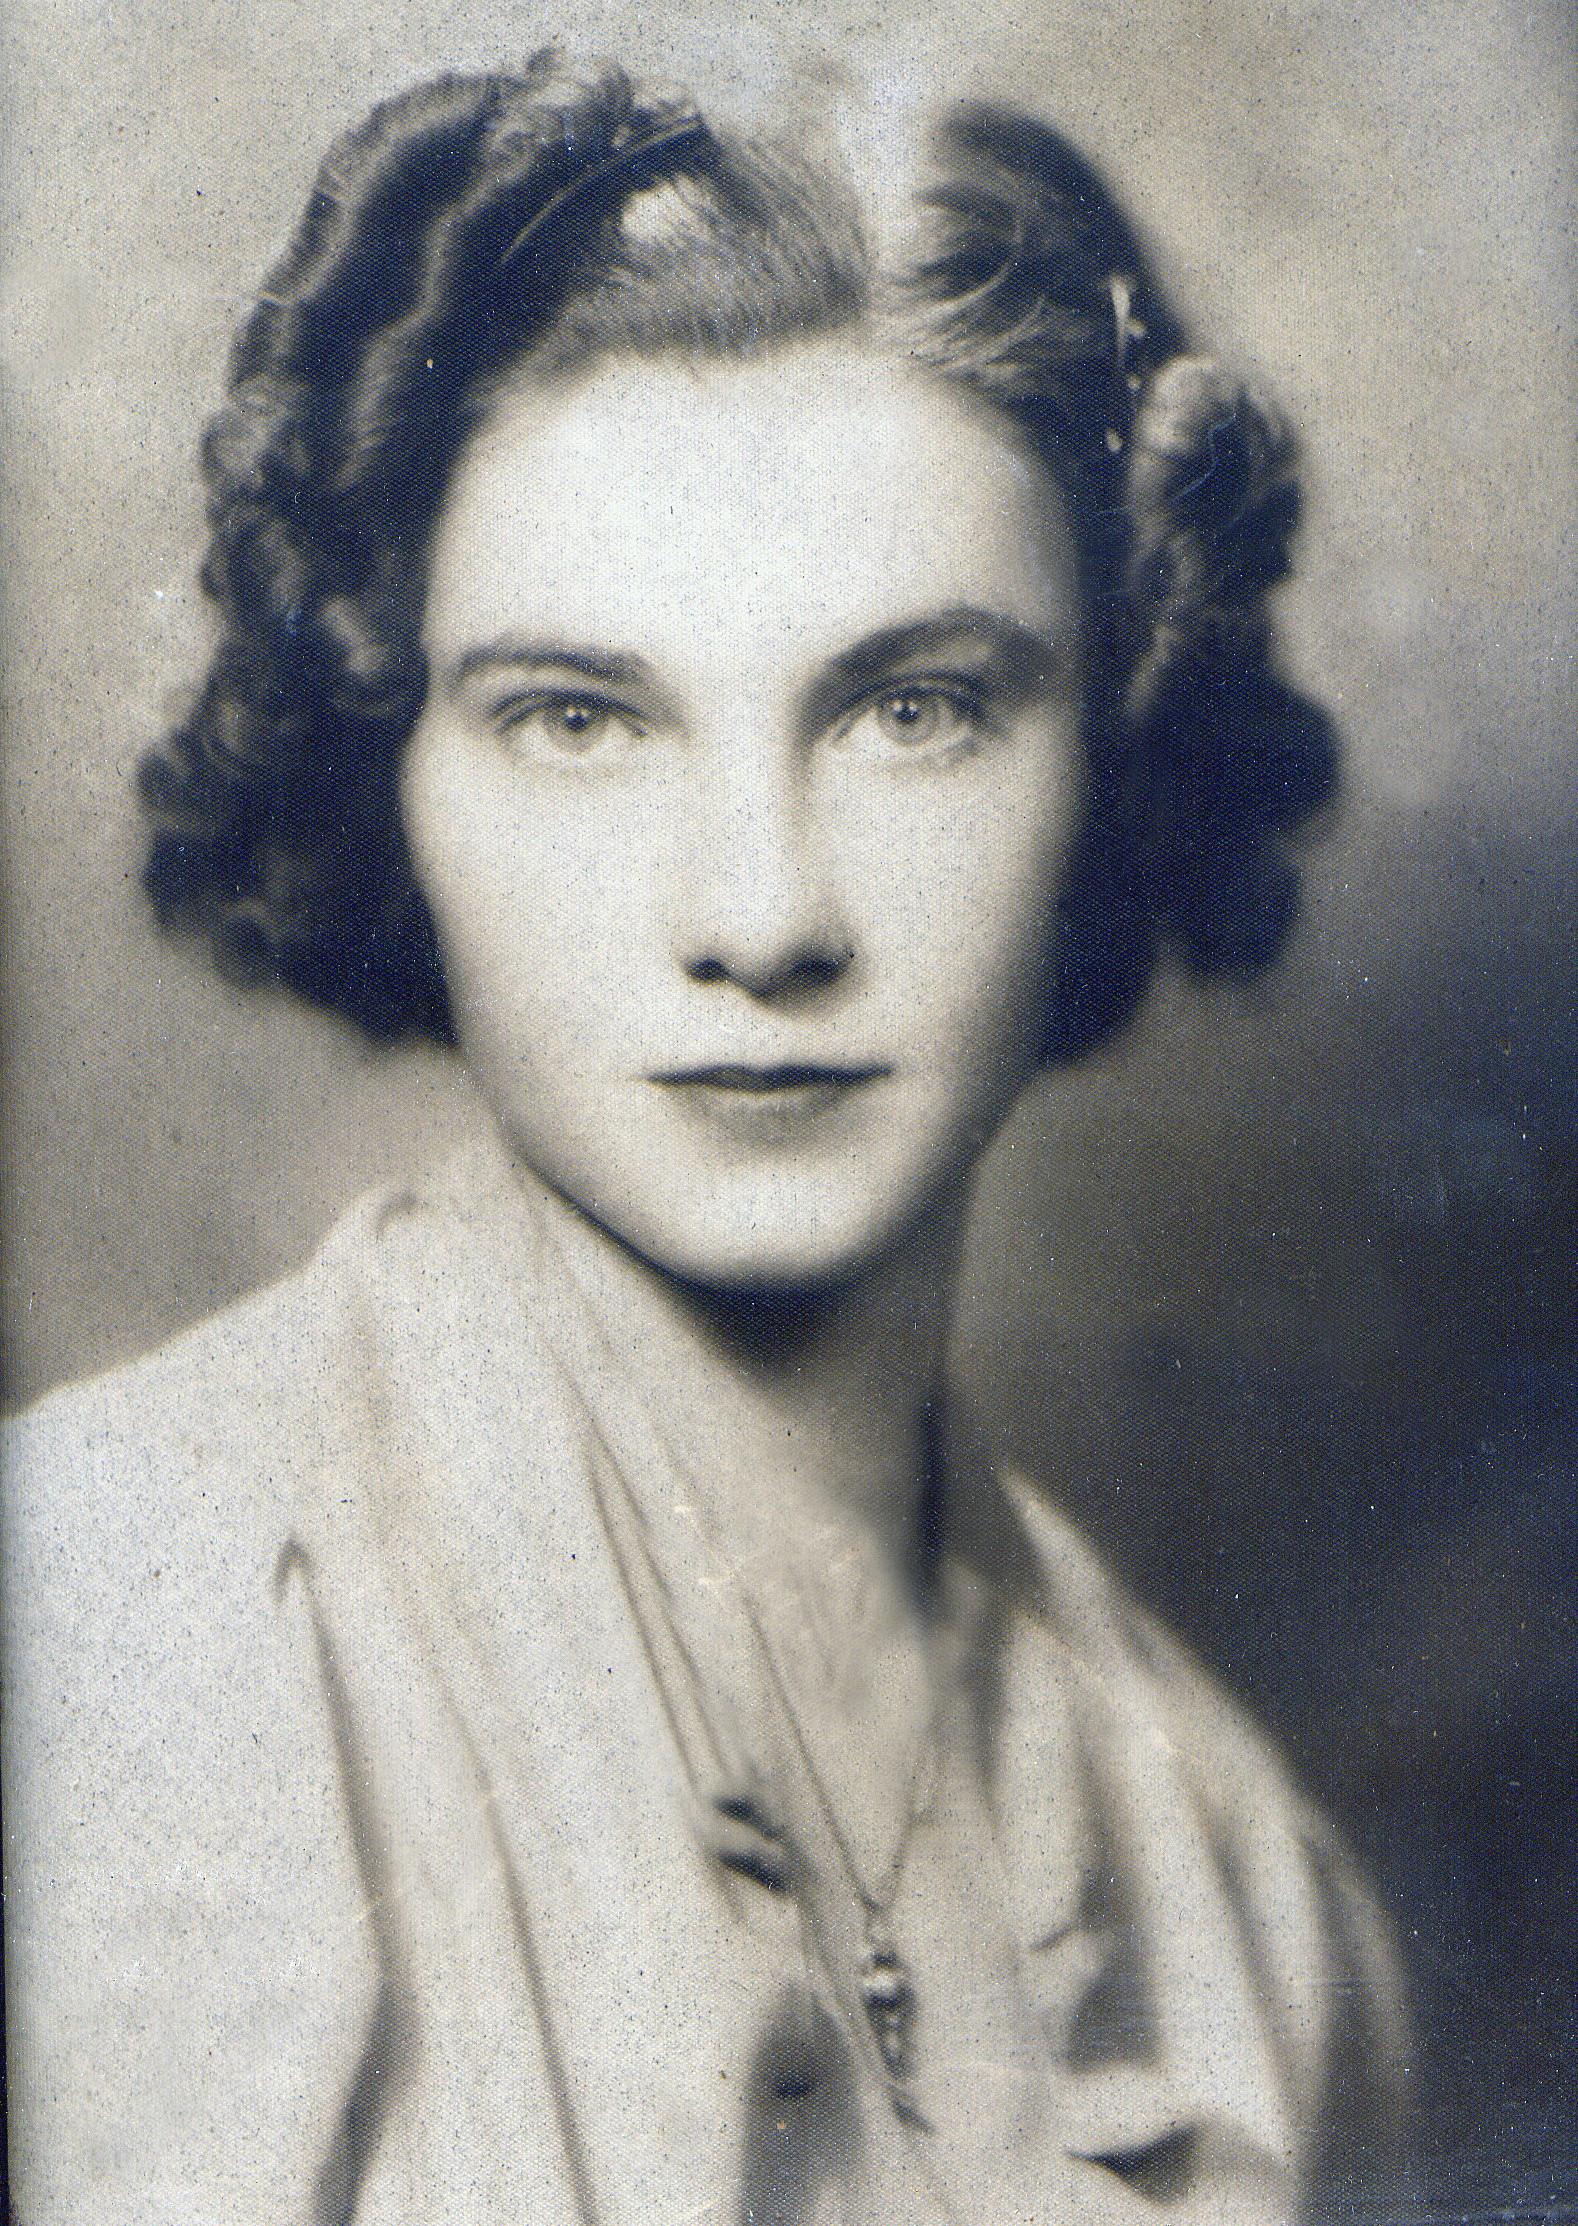 Betty Jean Mertz